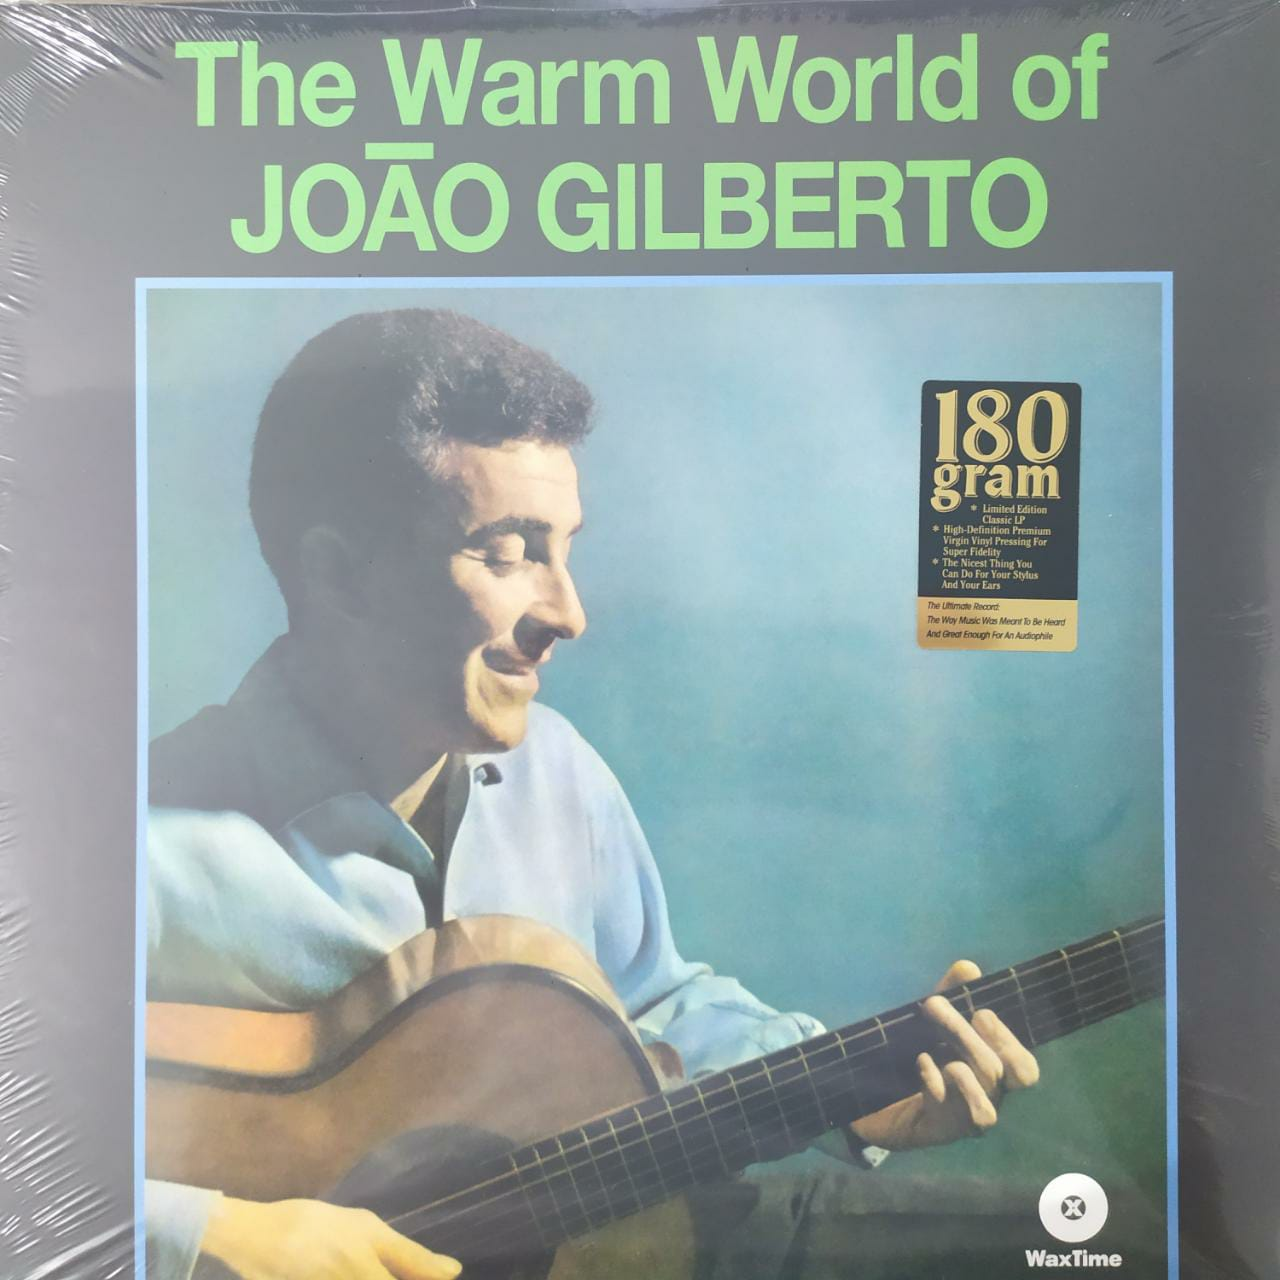 Lp João Gilberto The Warm World Of Novo Lacrado 180g  - Casafaz